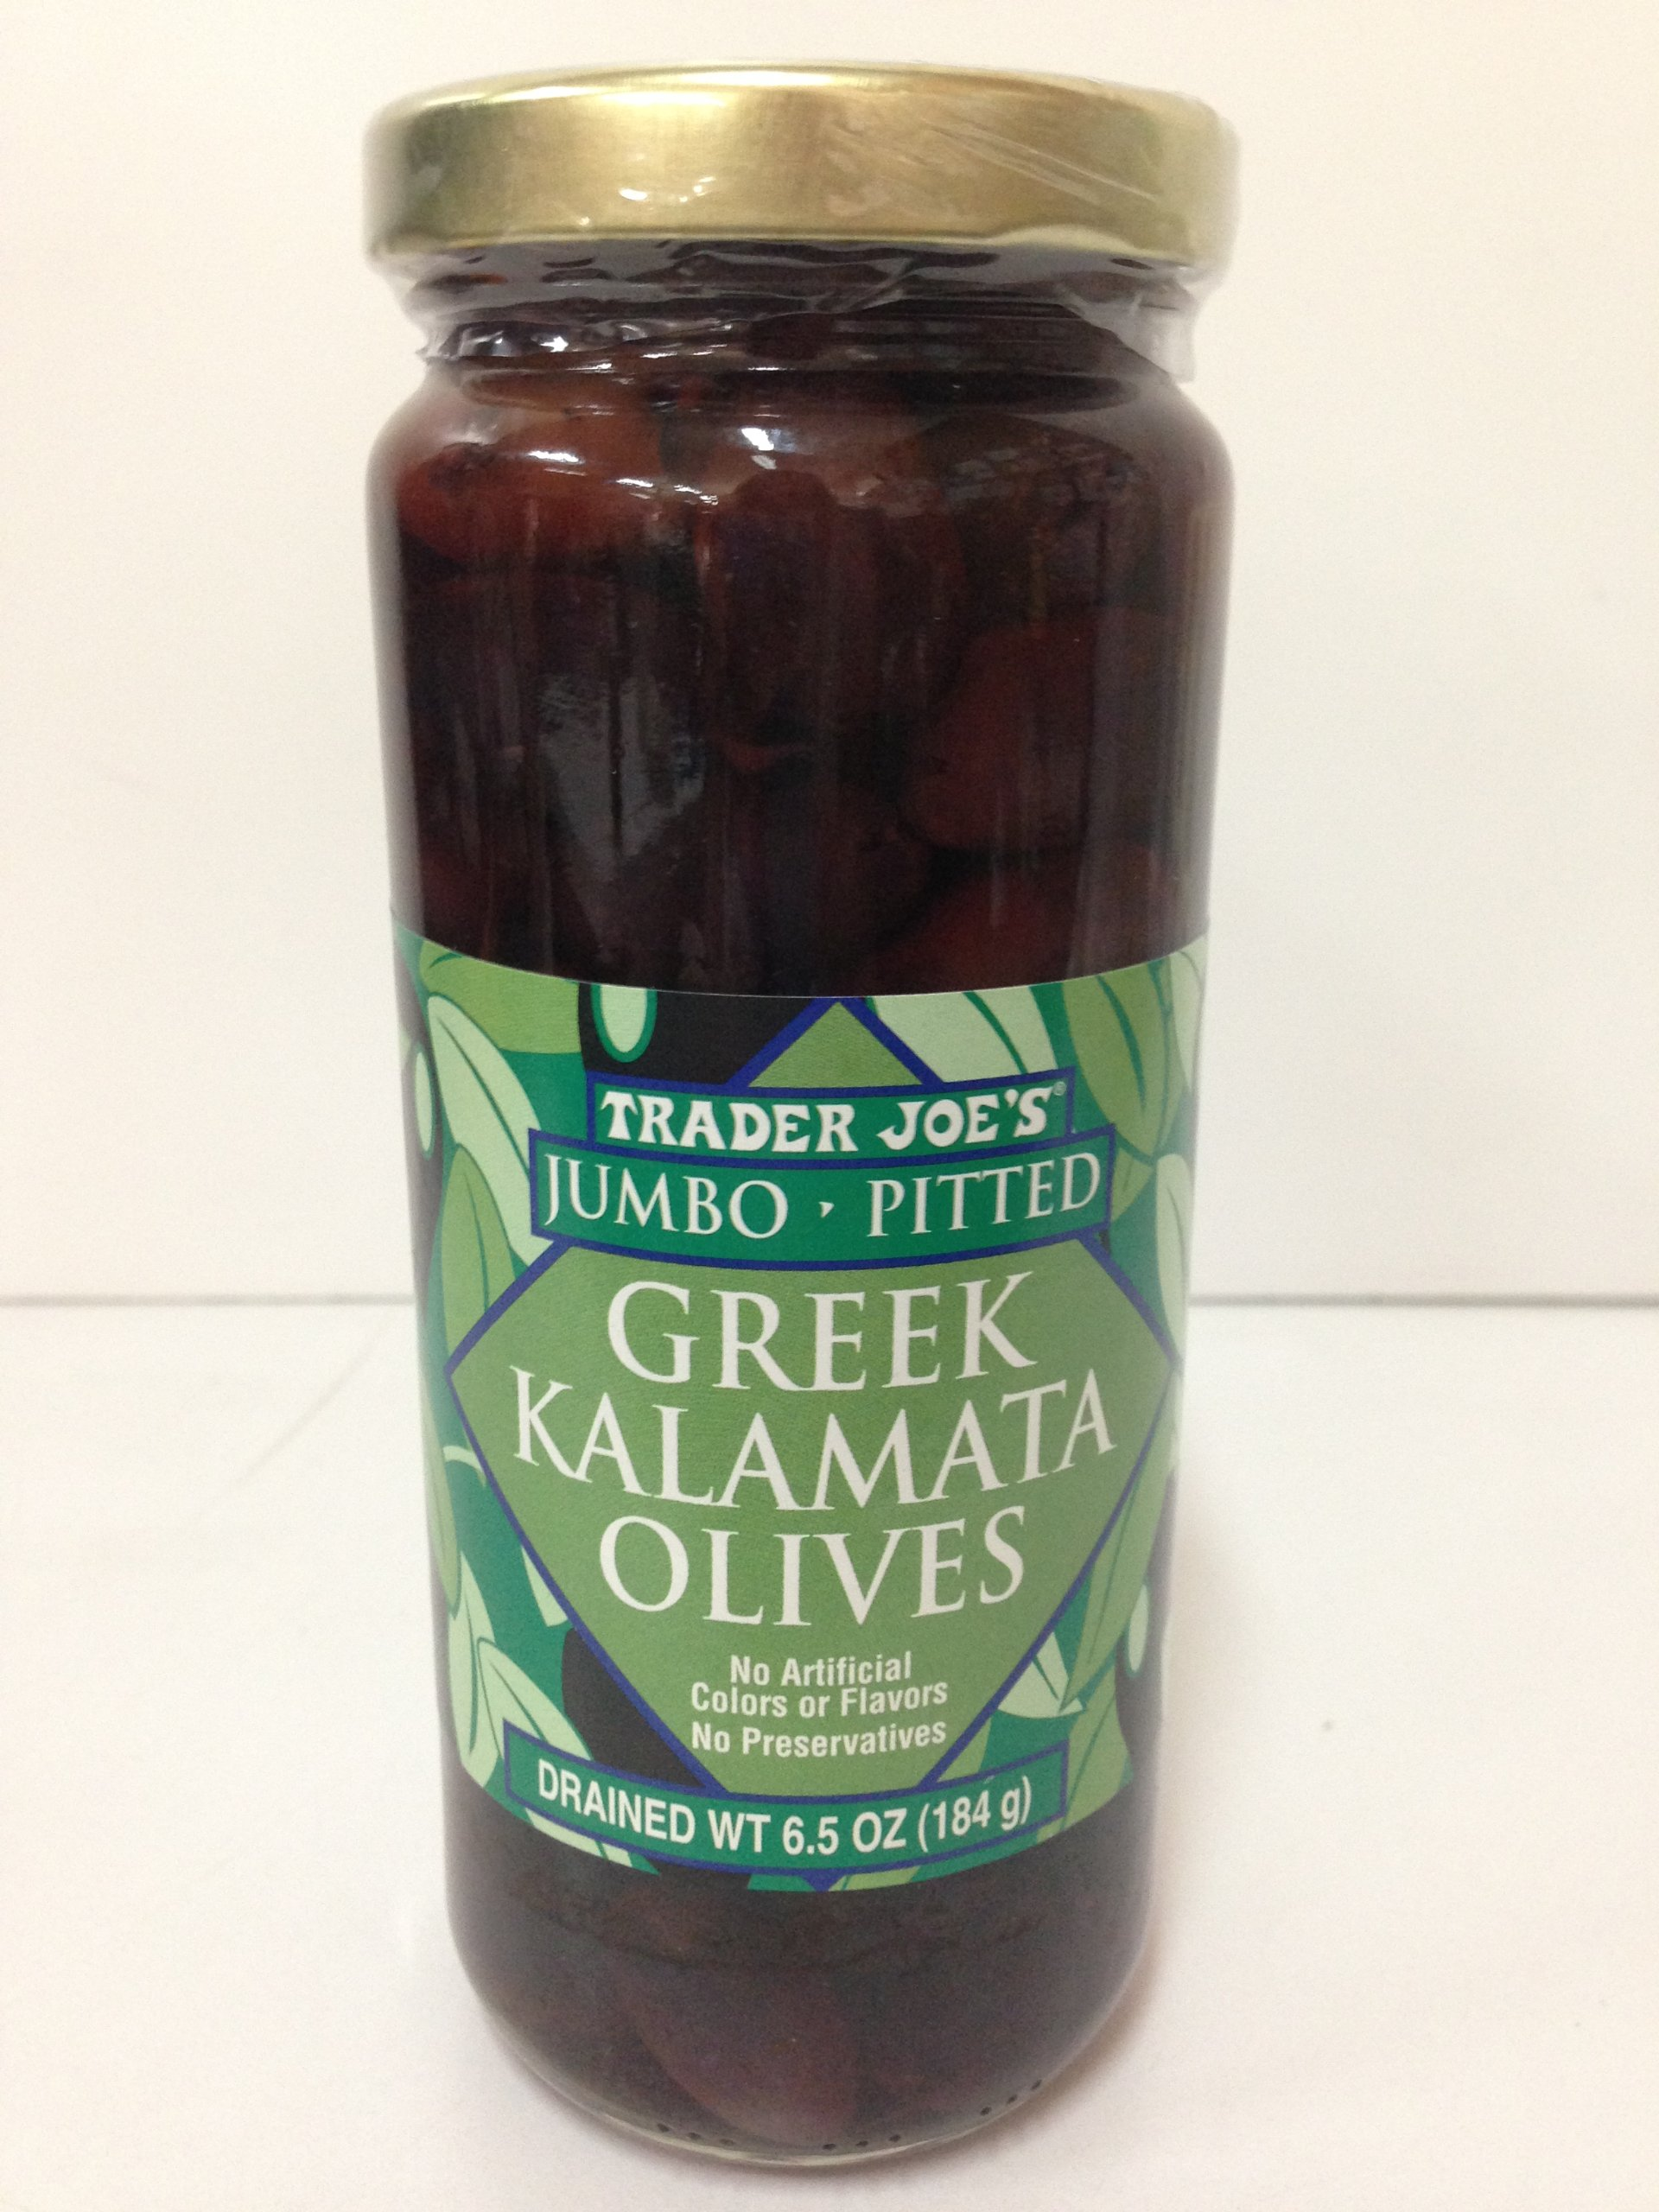 Trader Joe's Jumbo - Pitted Greek Kalamata Olives